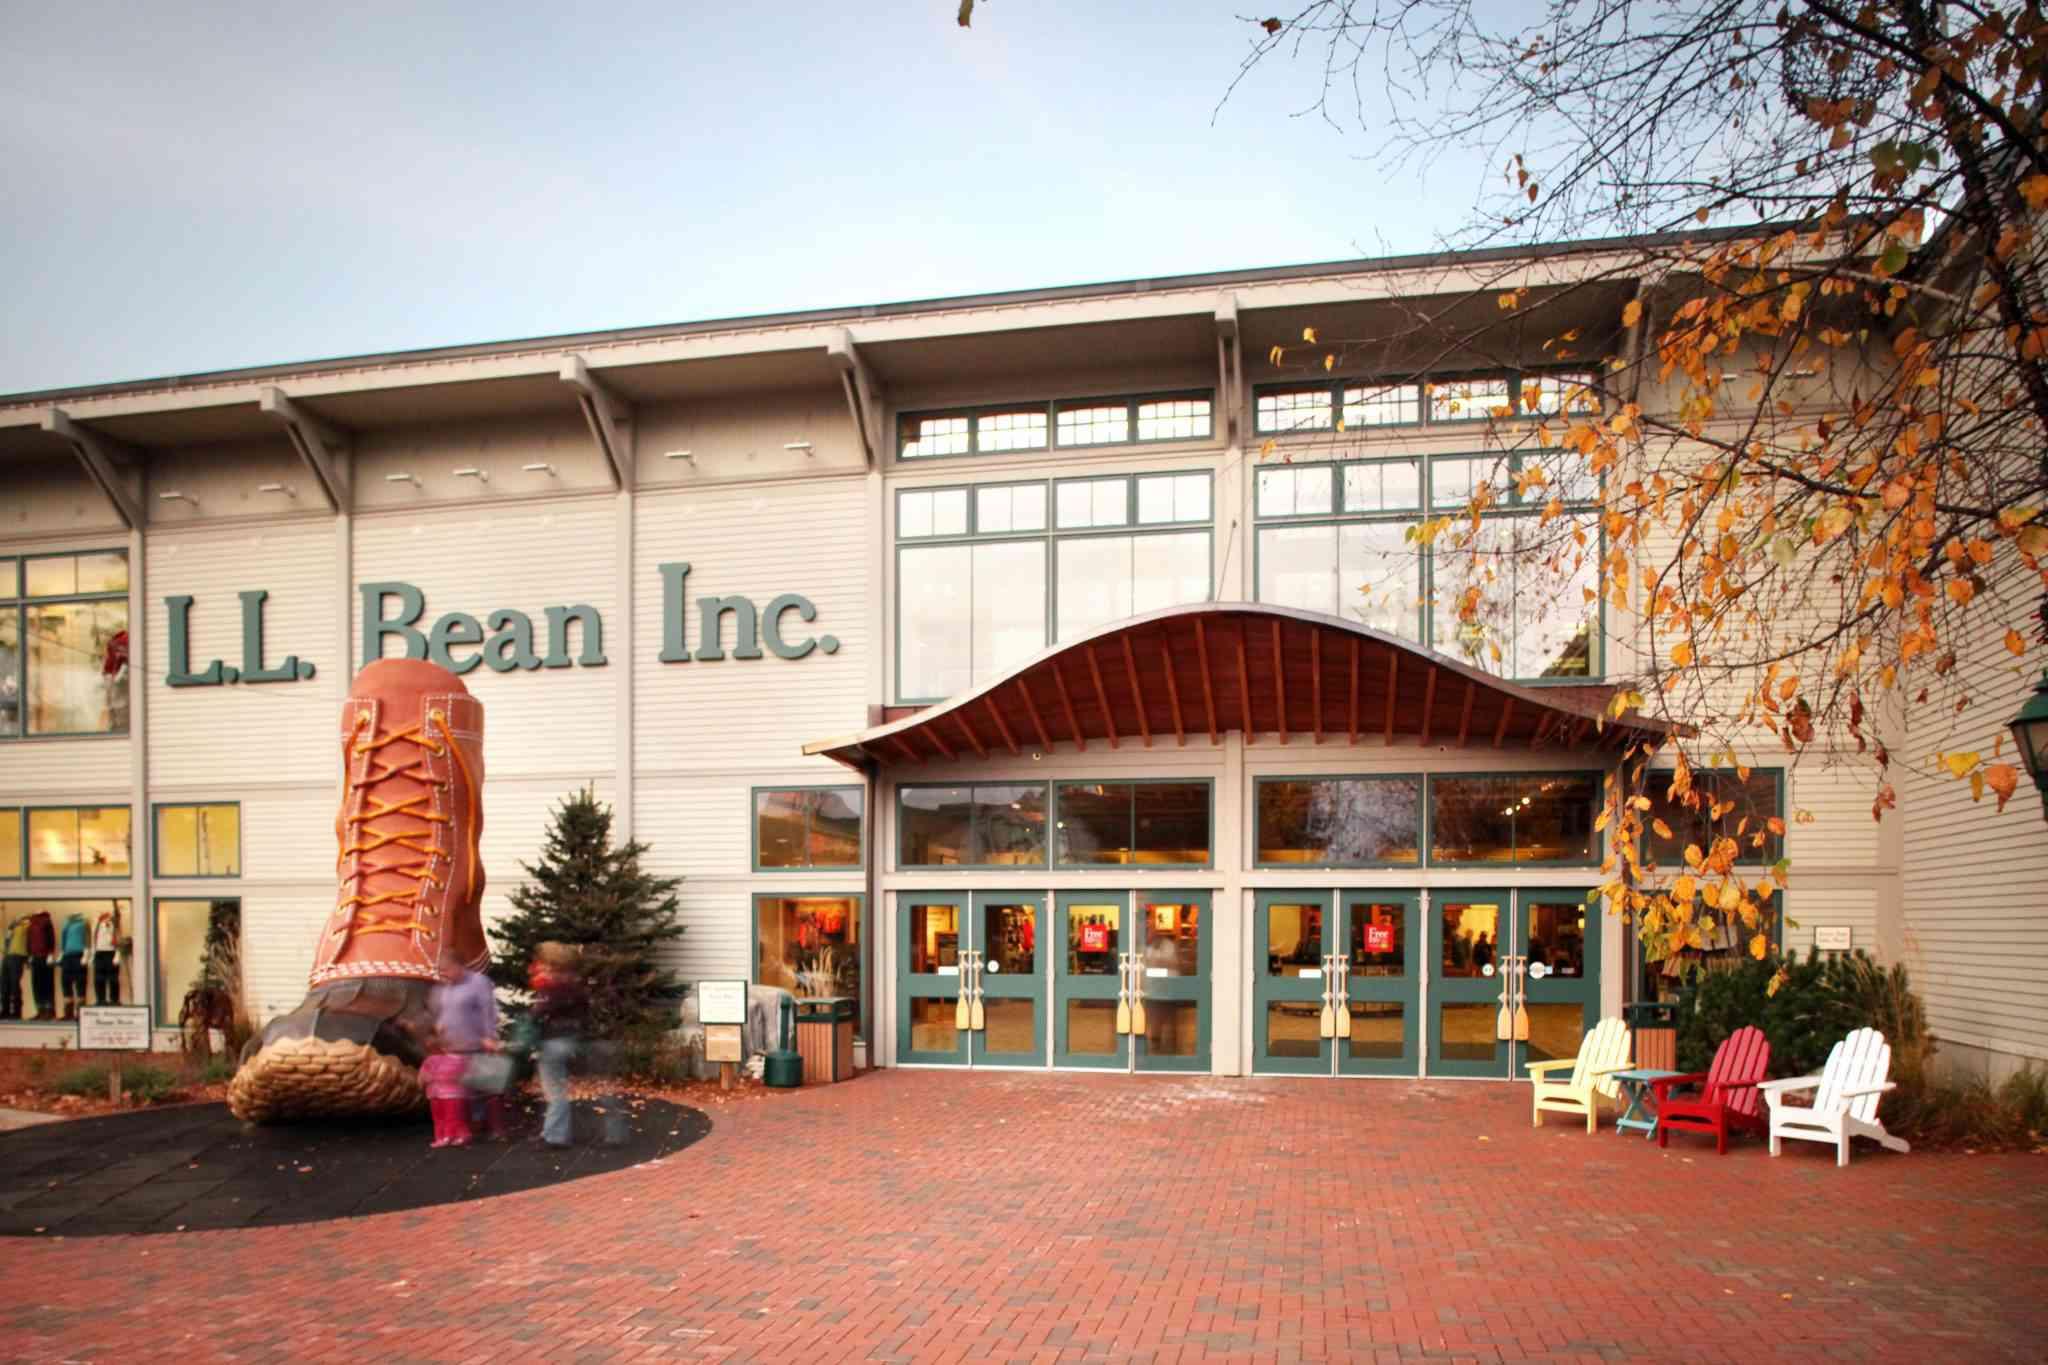 L.L. Bean Inc. Flagship Store, Freeport